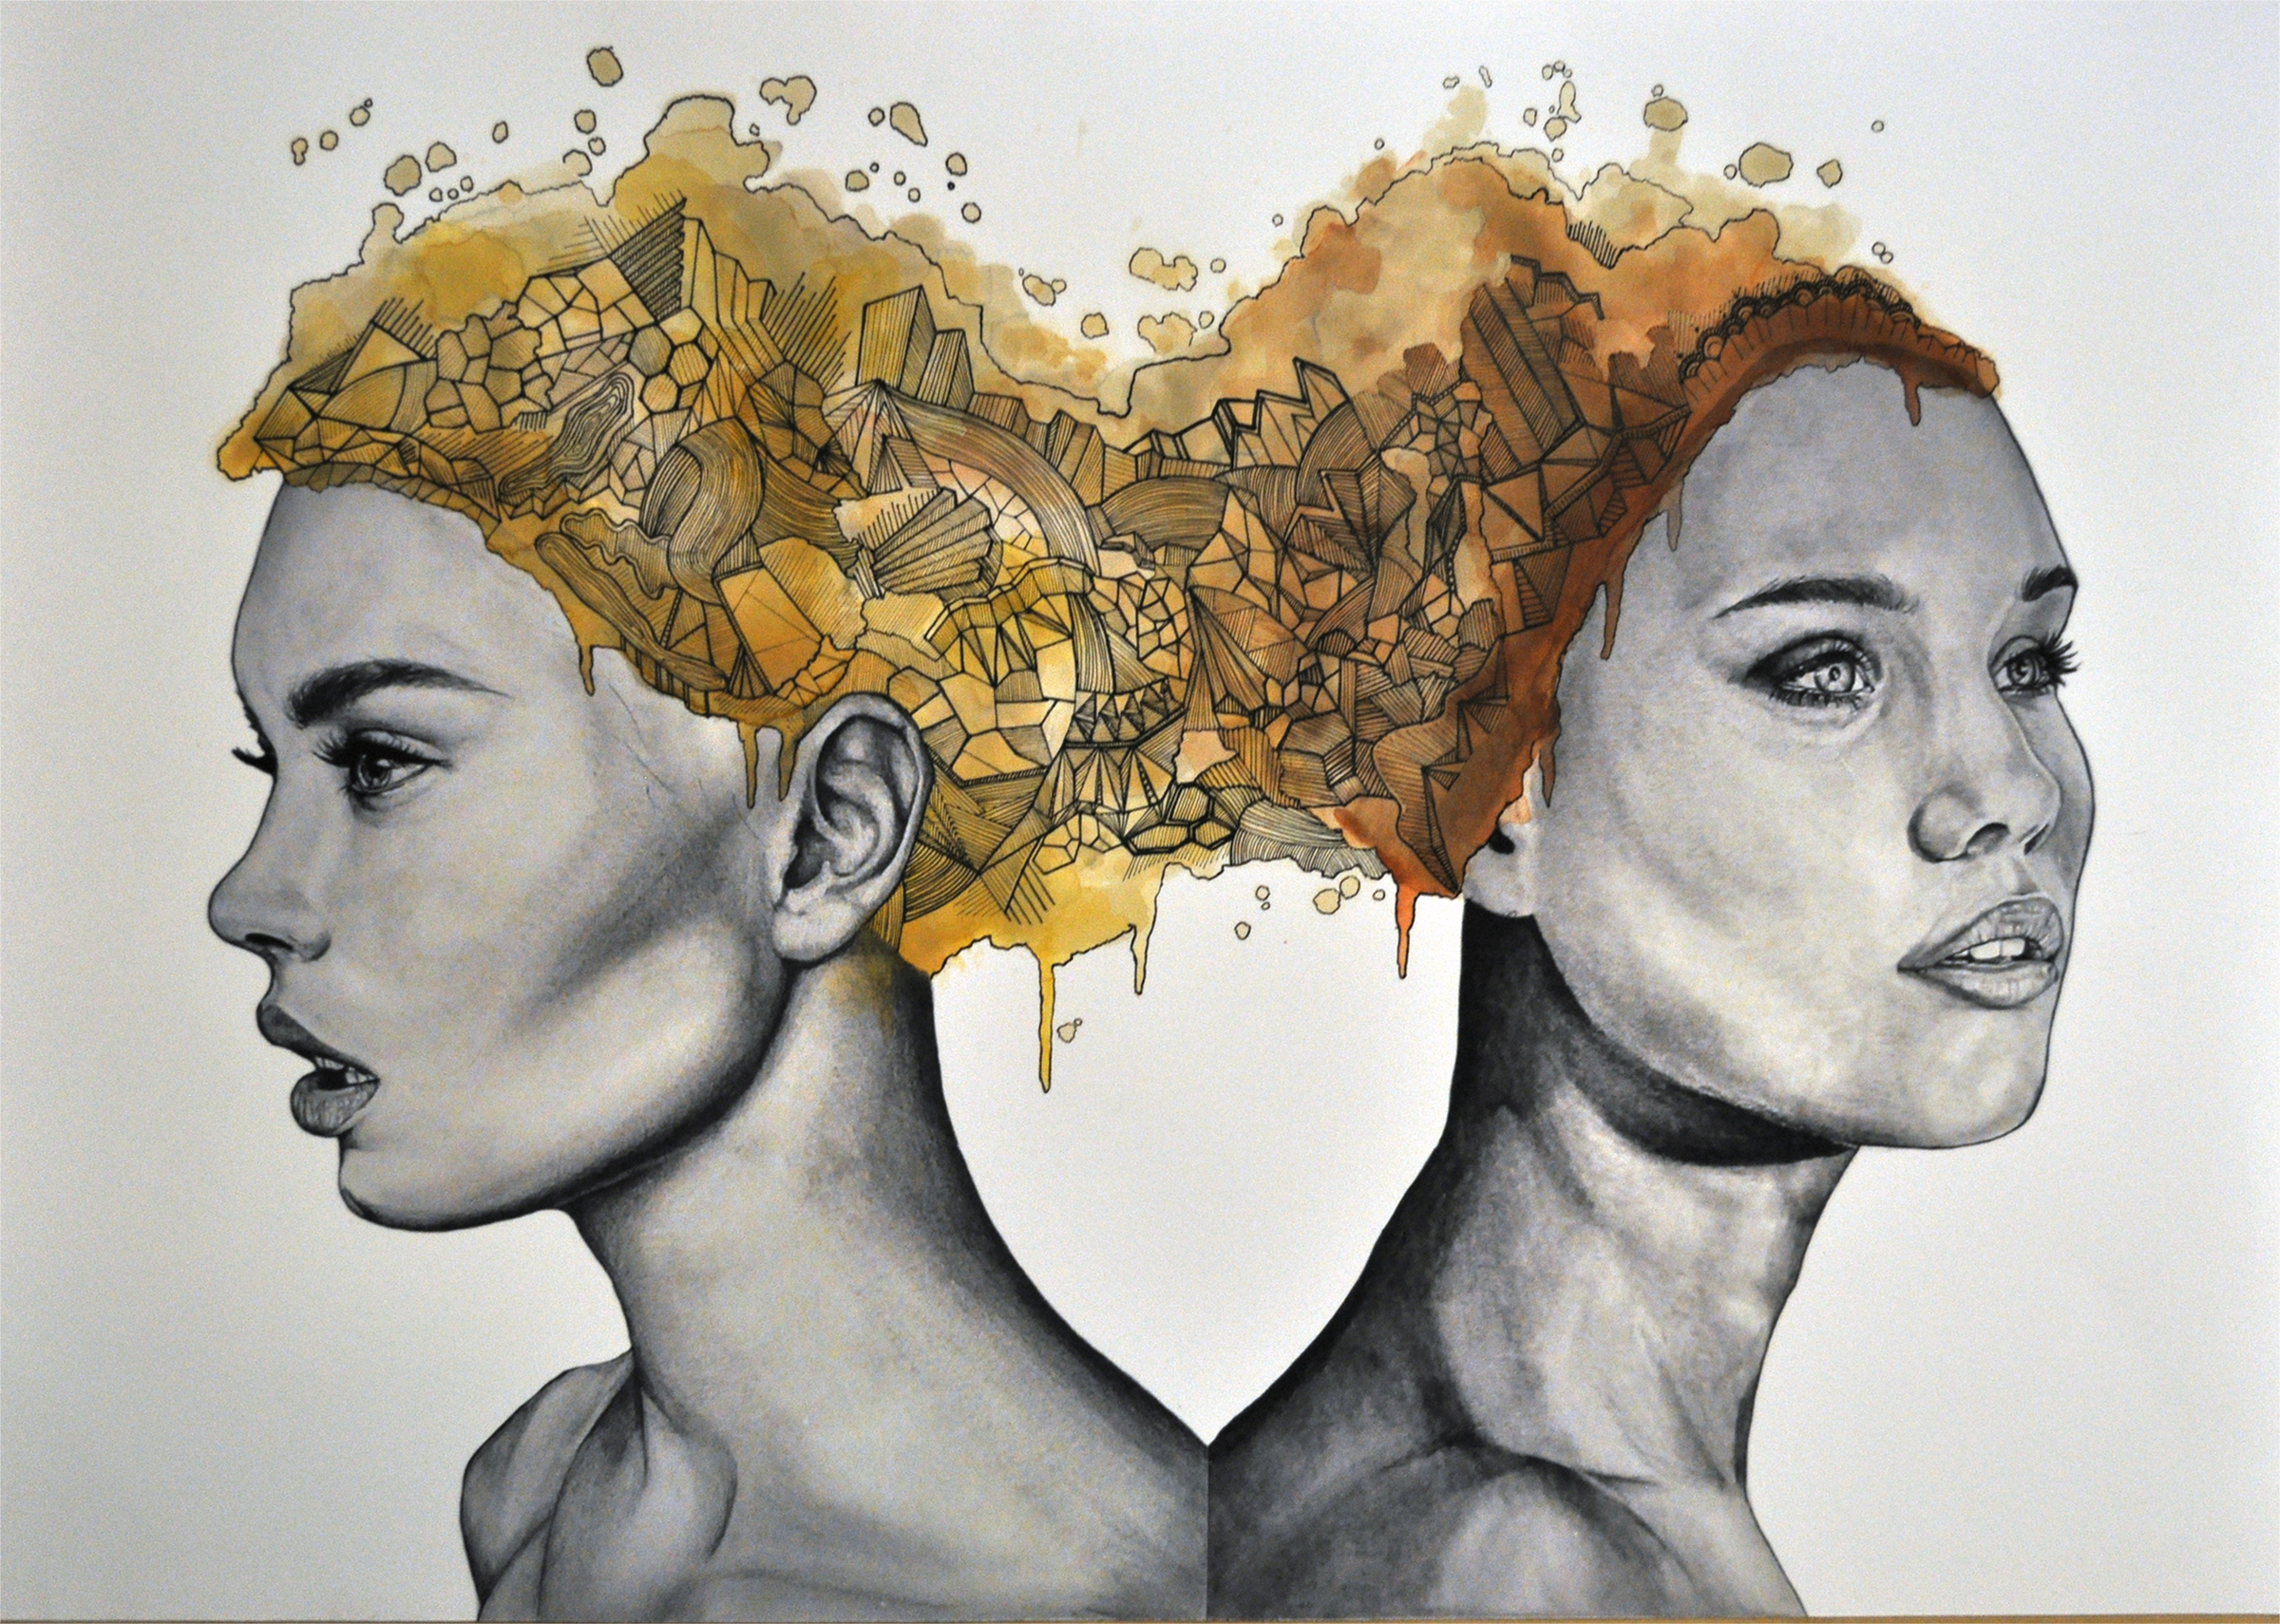 Art by Kristen Nadolski